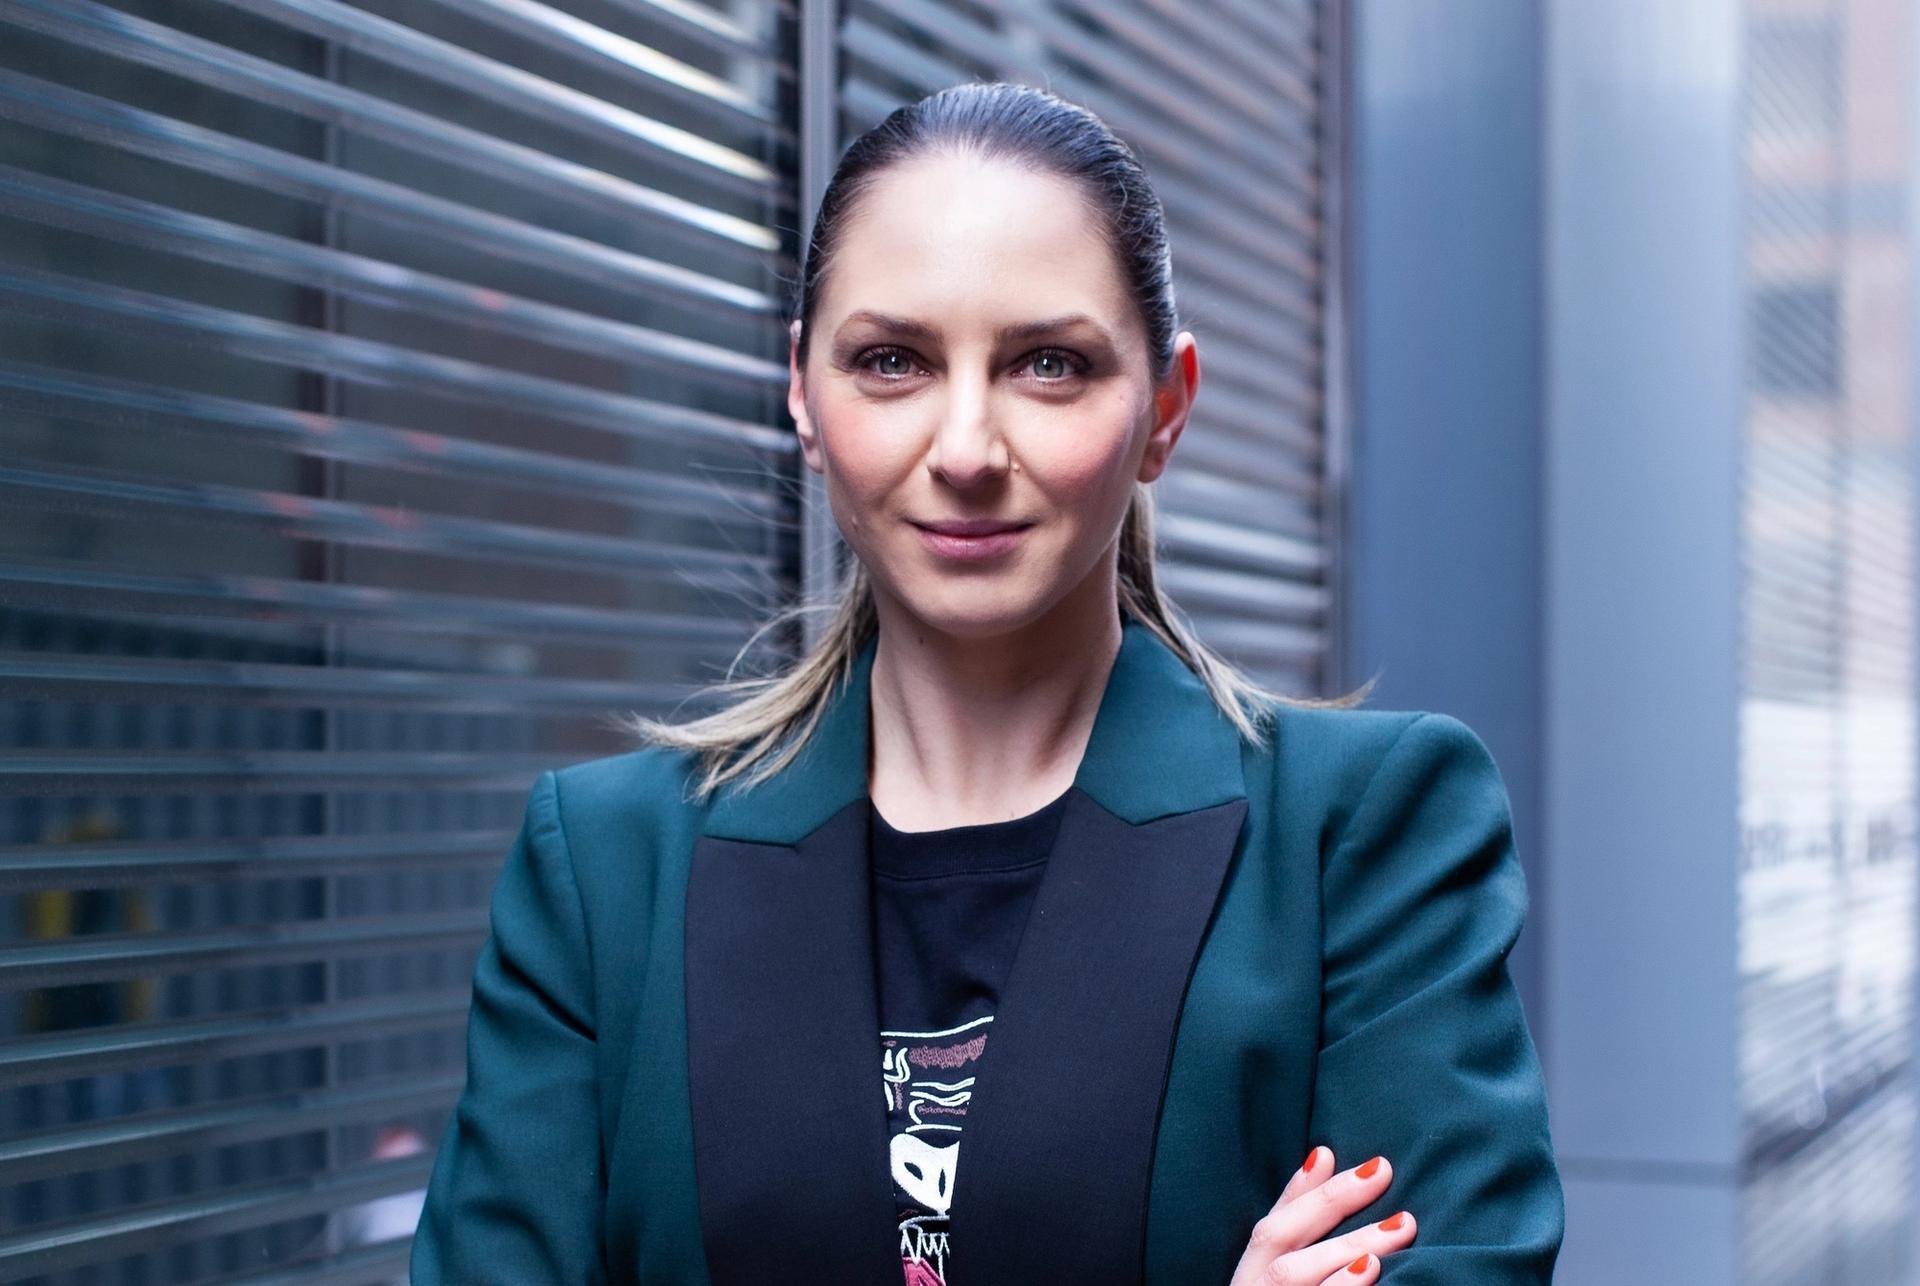 Melbourne Art Fair director Maree Di Pasquale